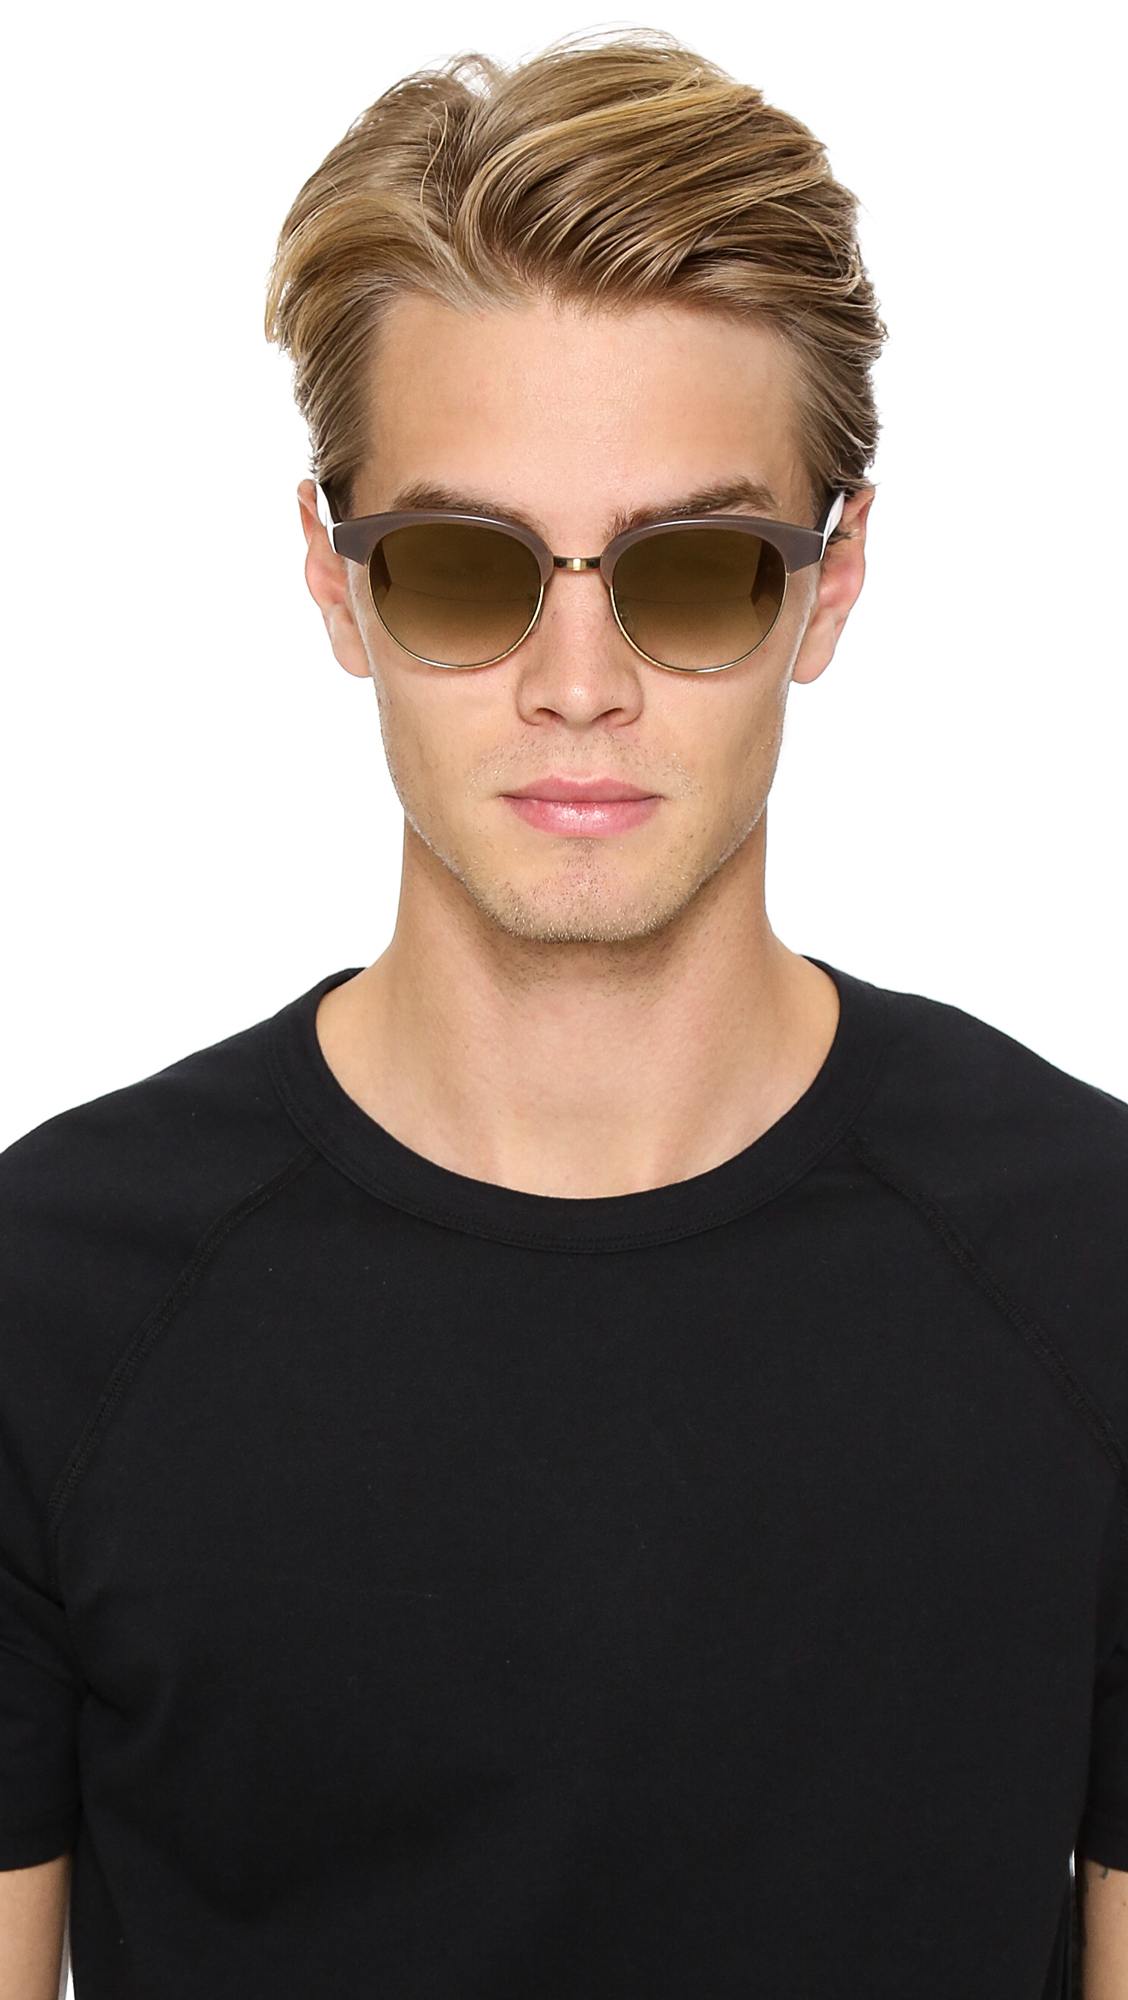 Paul Smith 'Redbury' sunglasses Wiki Cheap Price Footlocker nSWZW